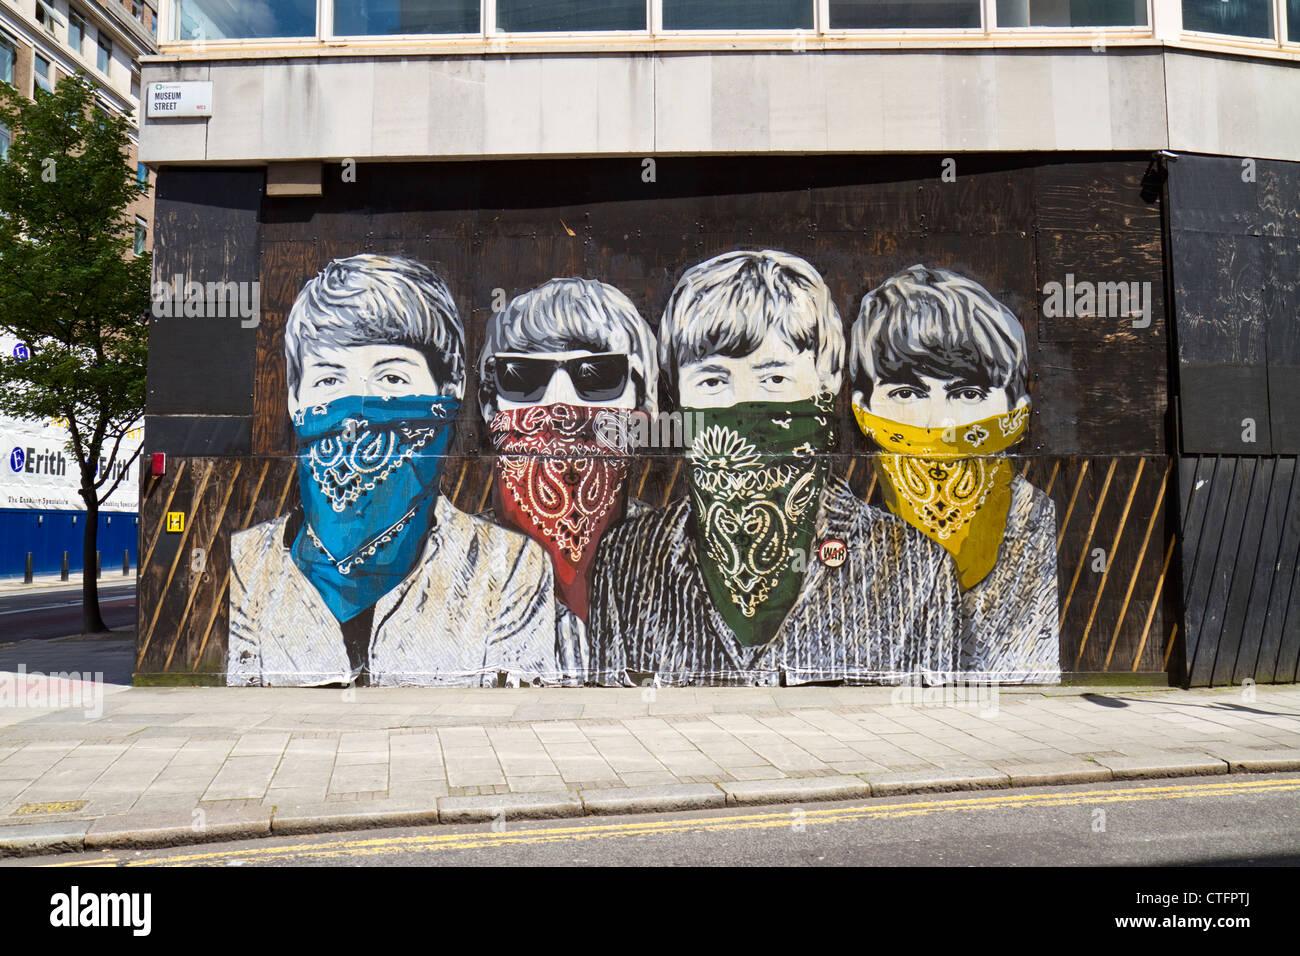 Gemeinsam gegen Corona!! - Seite 8 Paste-up-by-street-artist-mr-brainwash-in-london-depicting-the-beatles-CTFPTJ